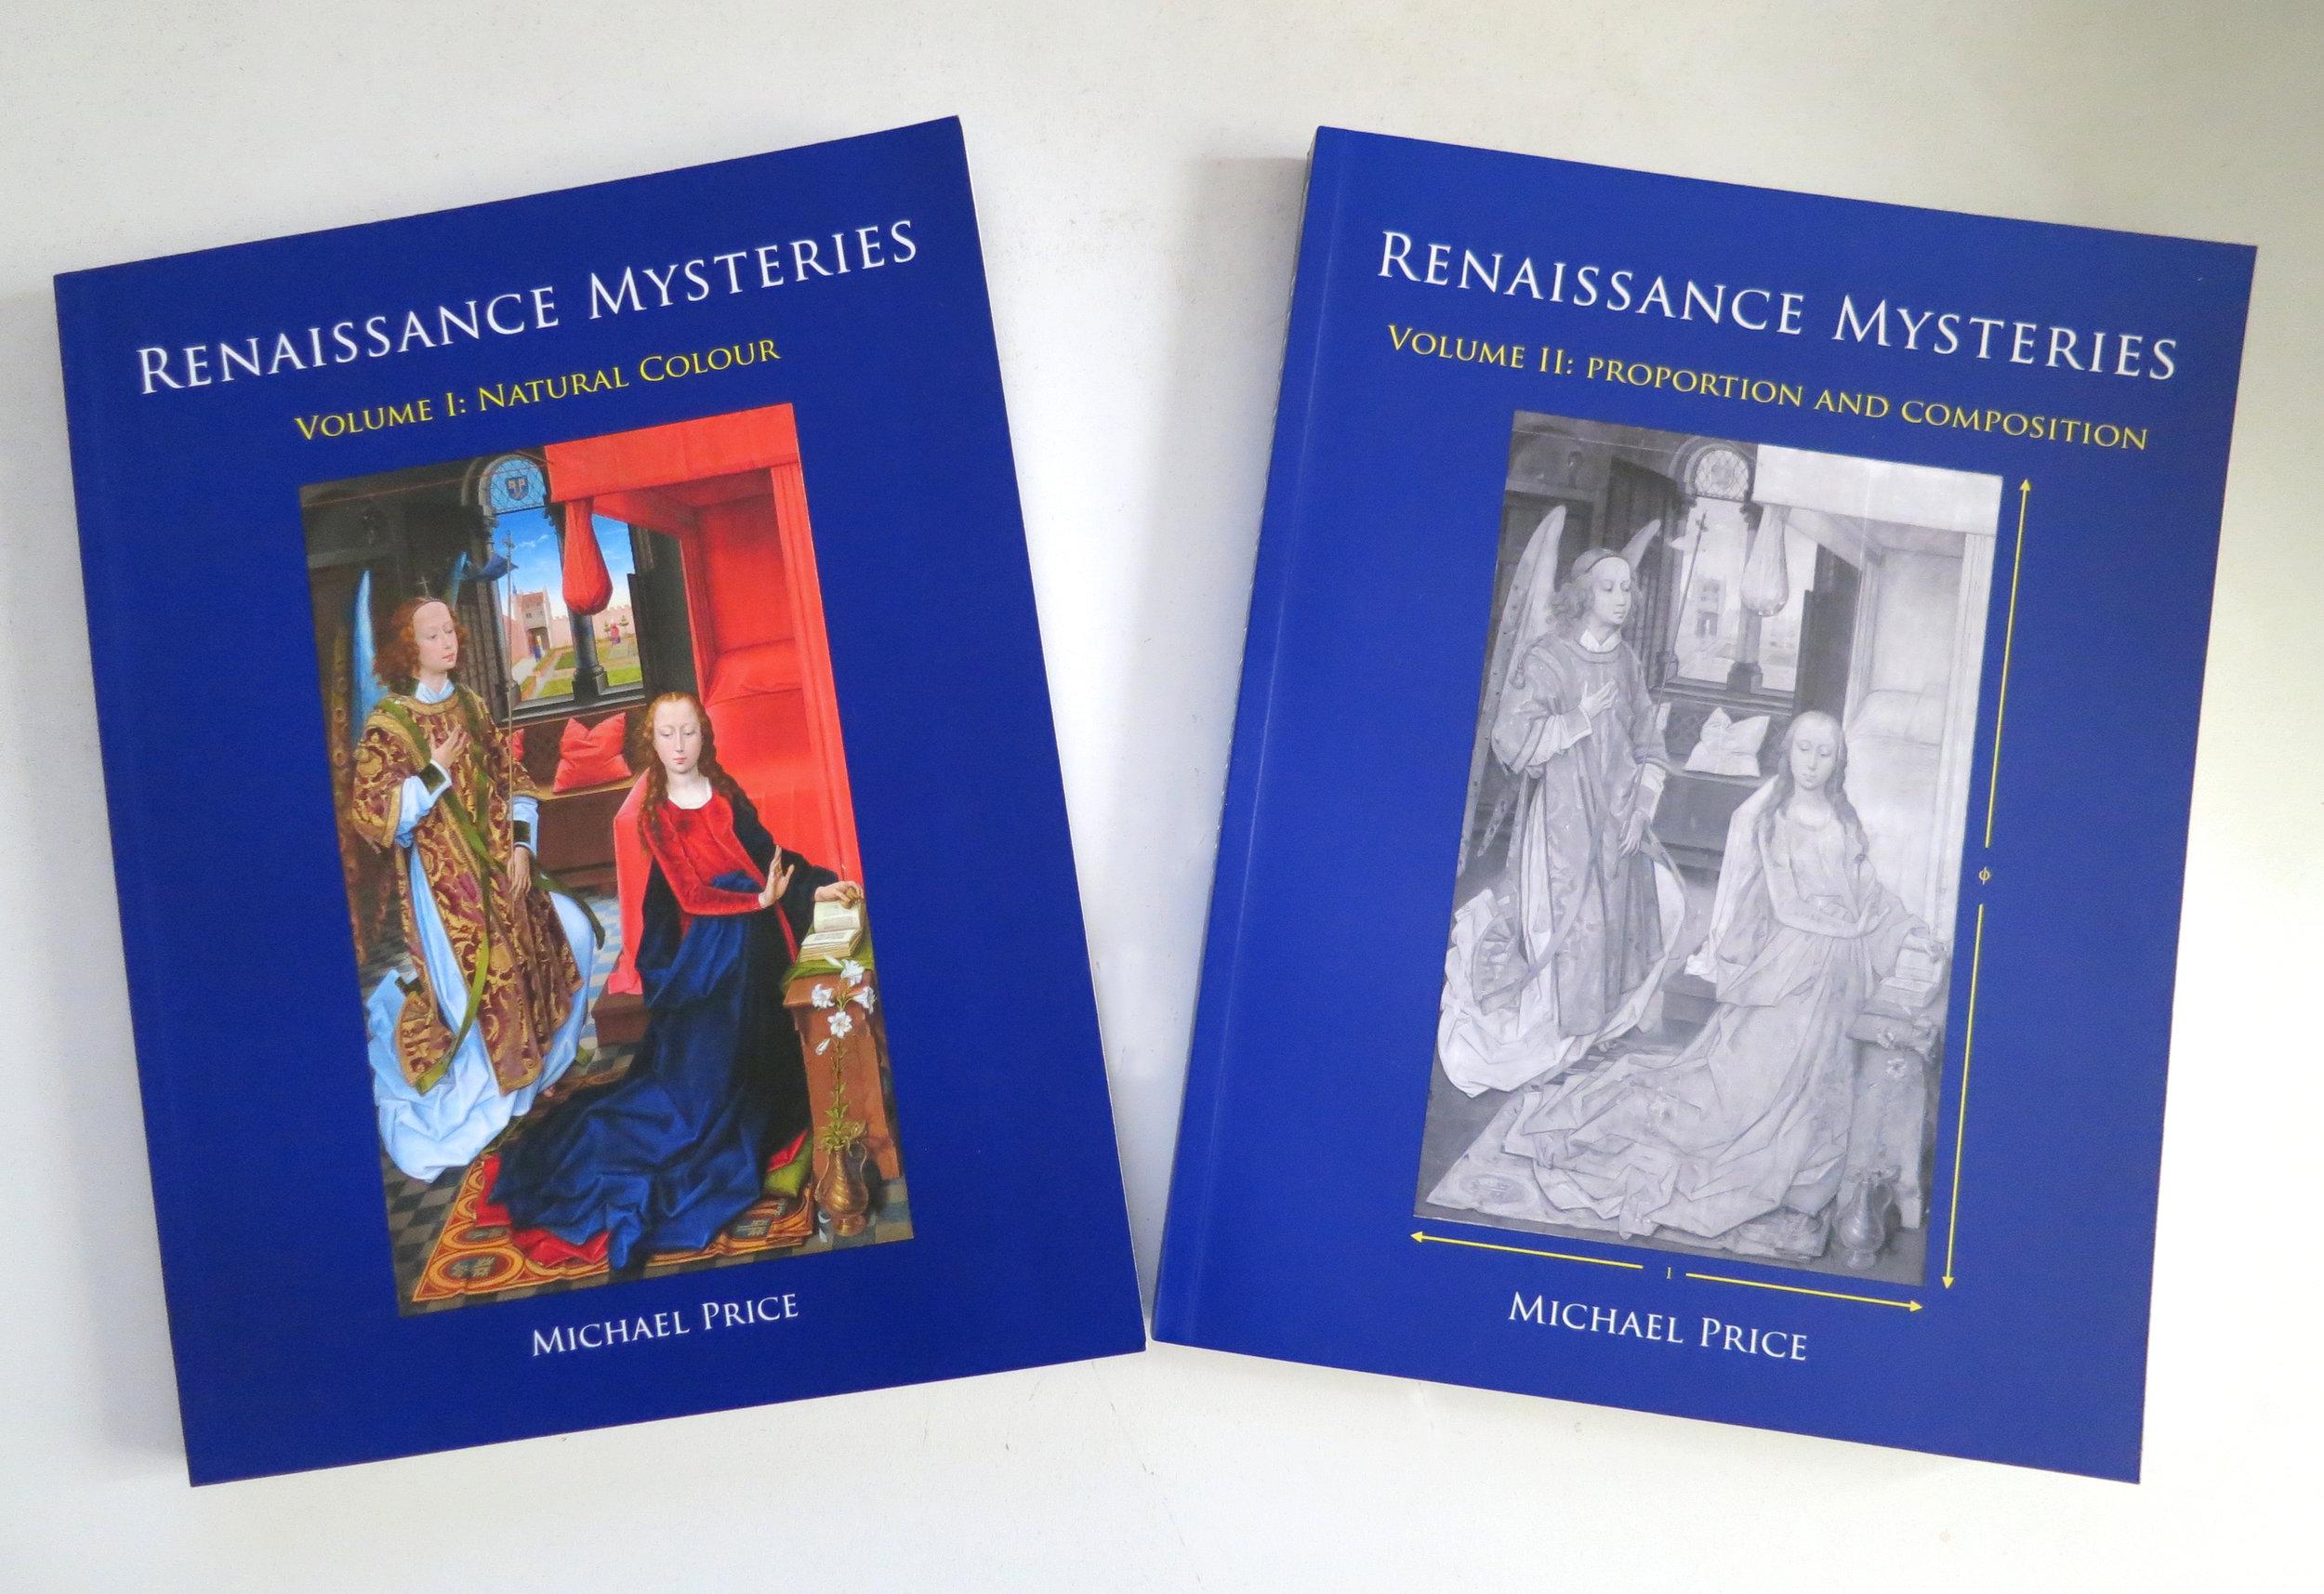 Renaissance Mysteries Volume I & Volume II